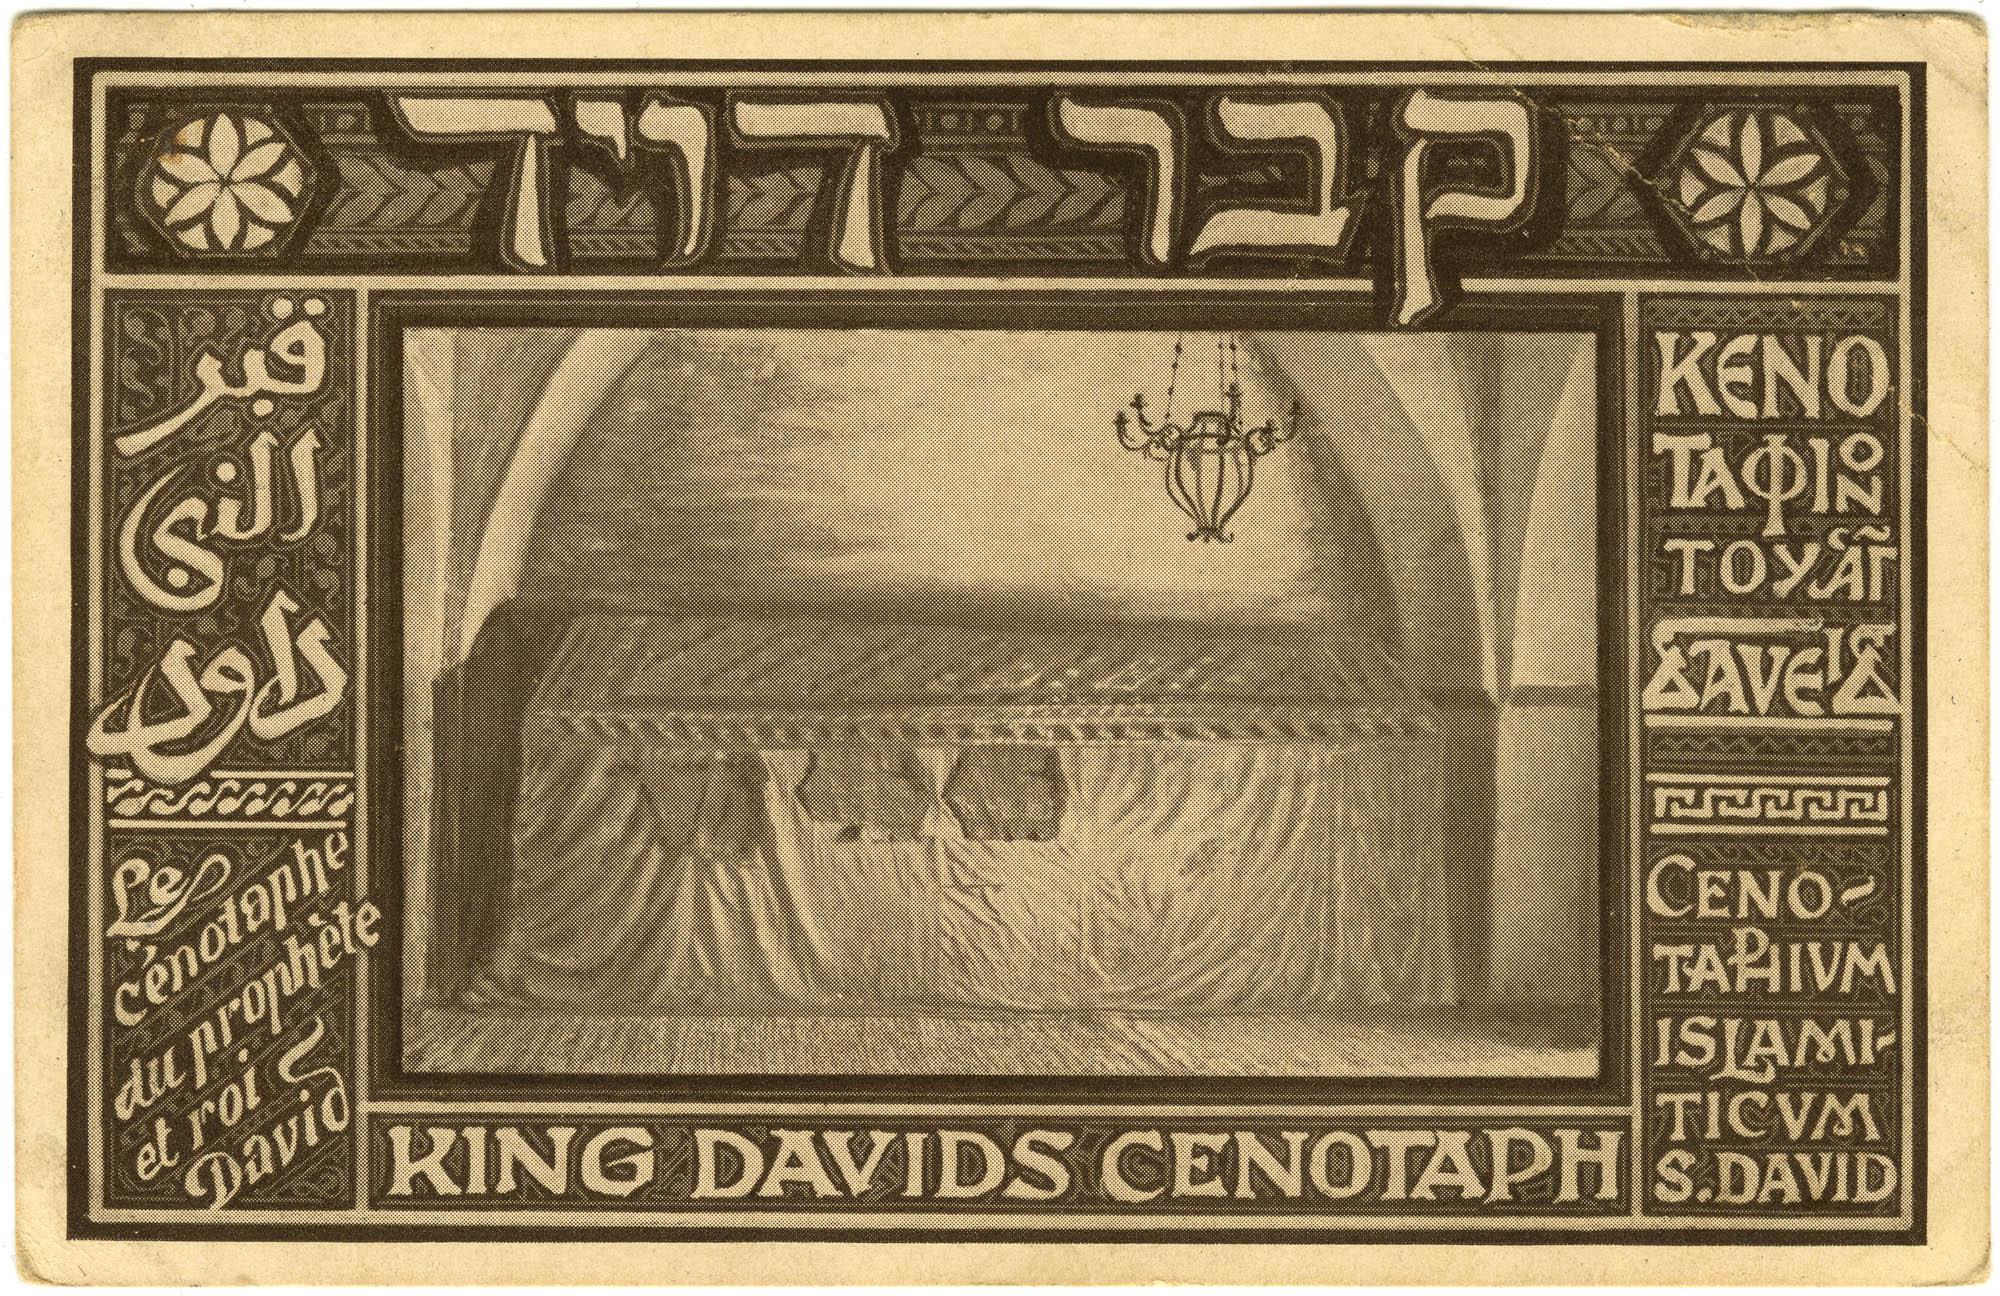 קבר דוד / King David's cenotaph